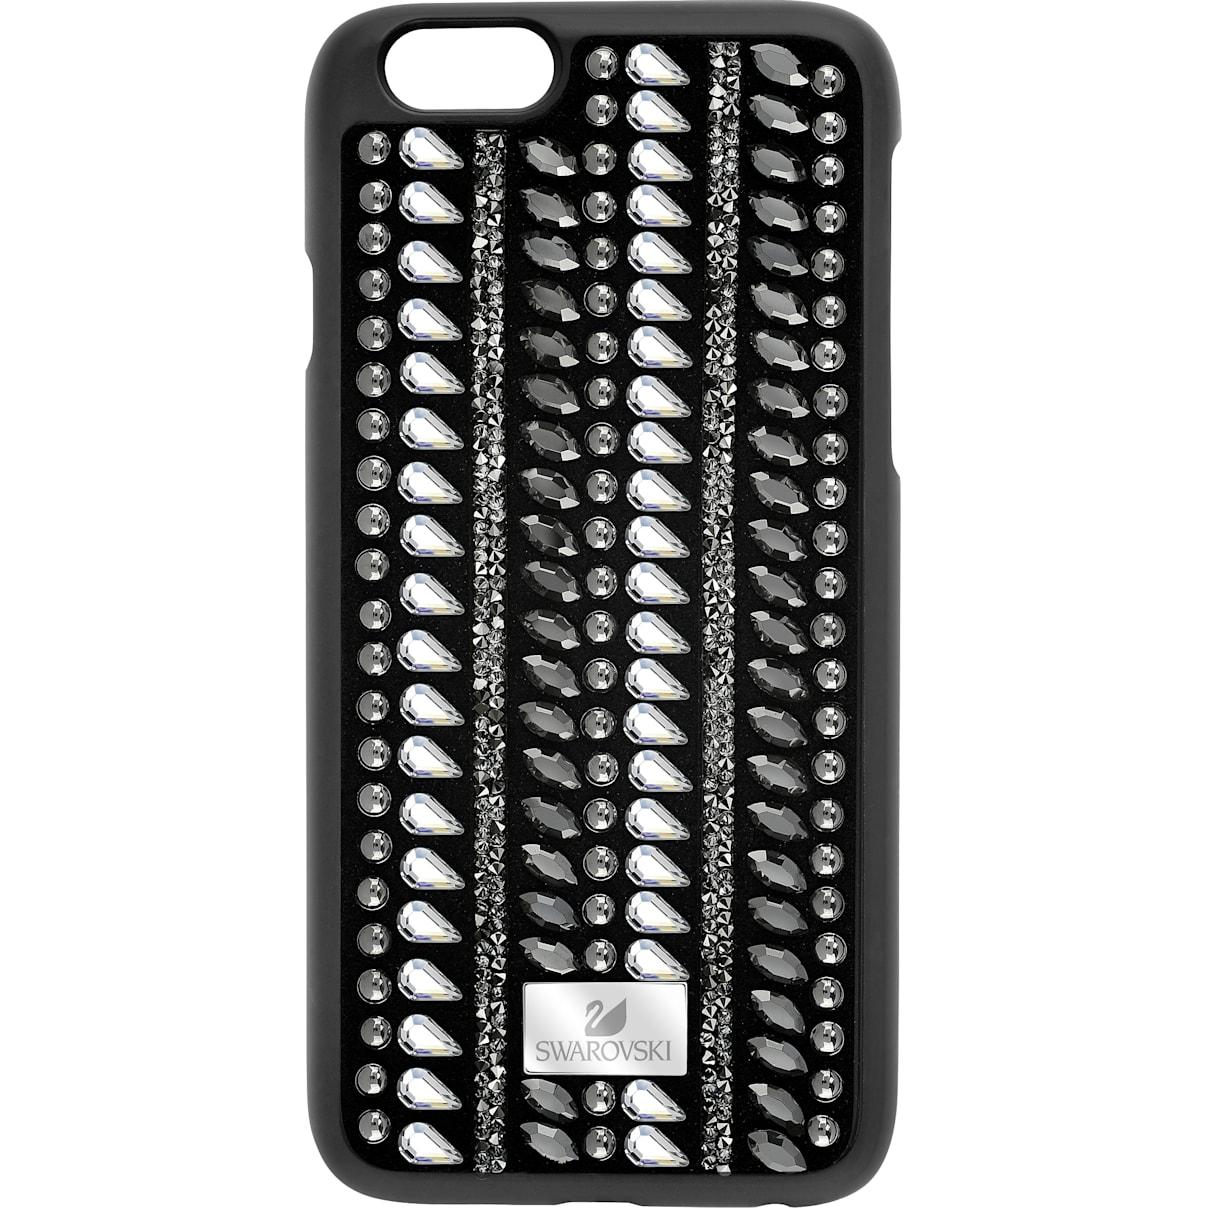 Swarovski Slake Pulse Rock Smartphone Case with Bumper, iPhone® 7